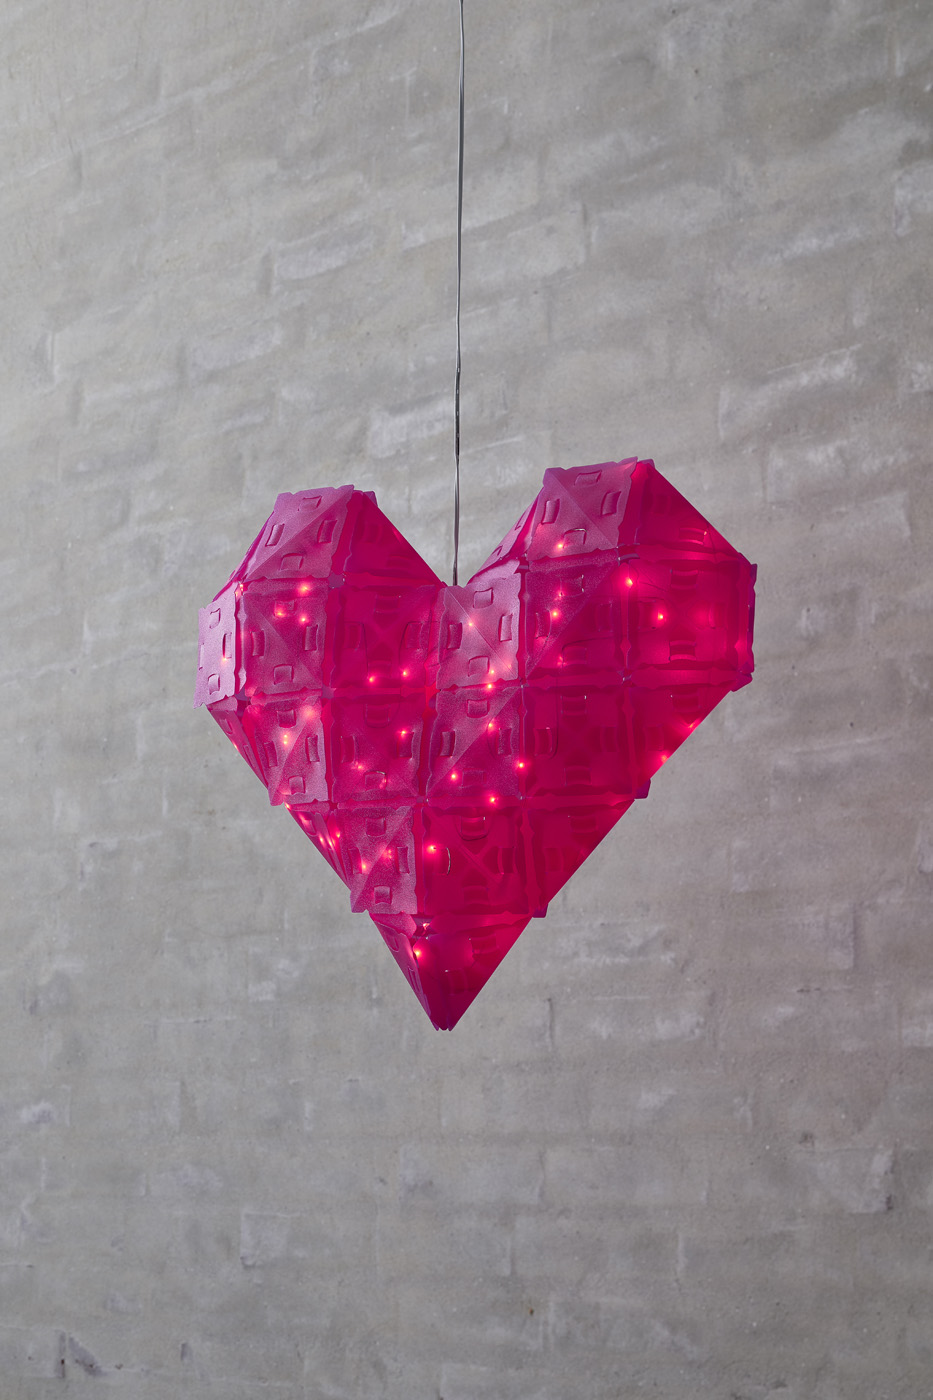 CREATTO_MOOD_LINE_LOVE_HEART.jpg